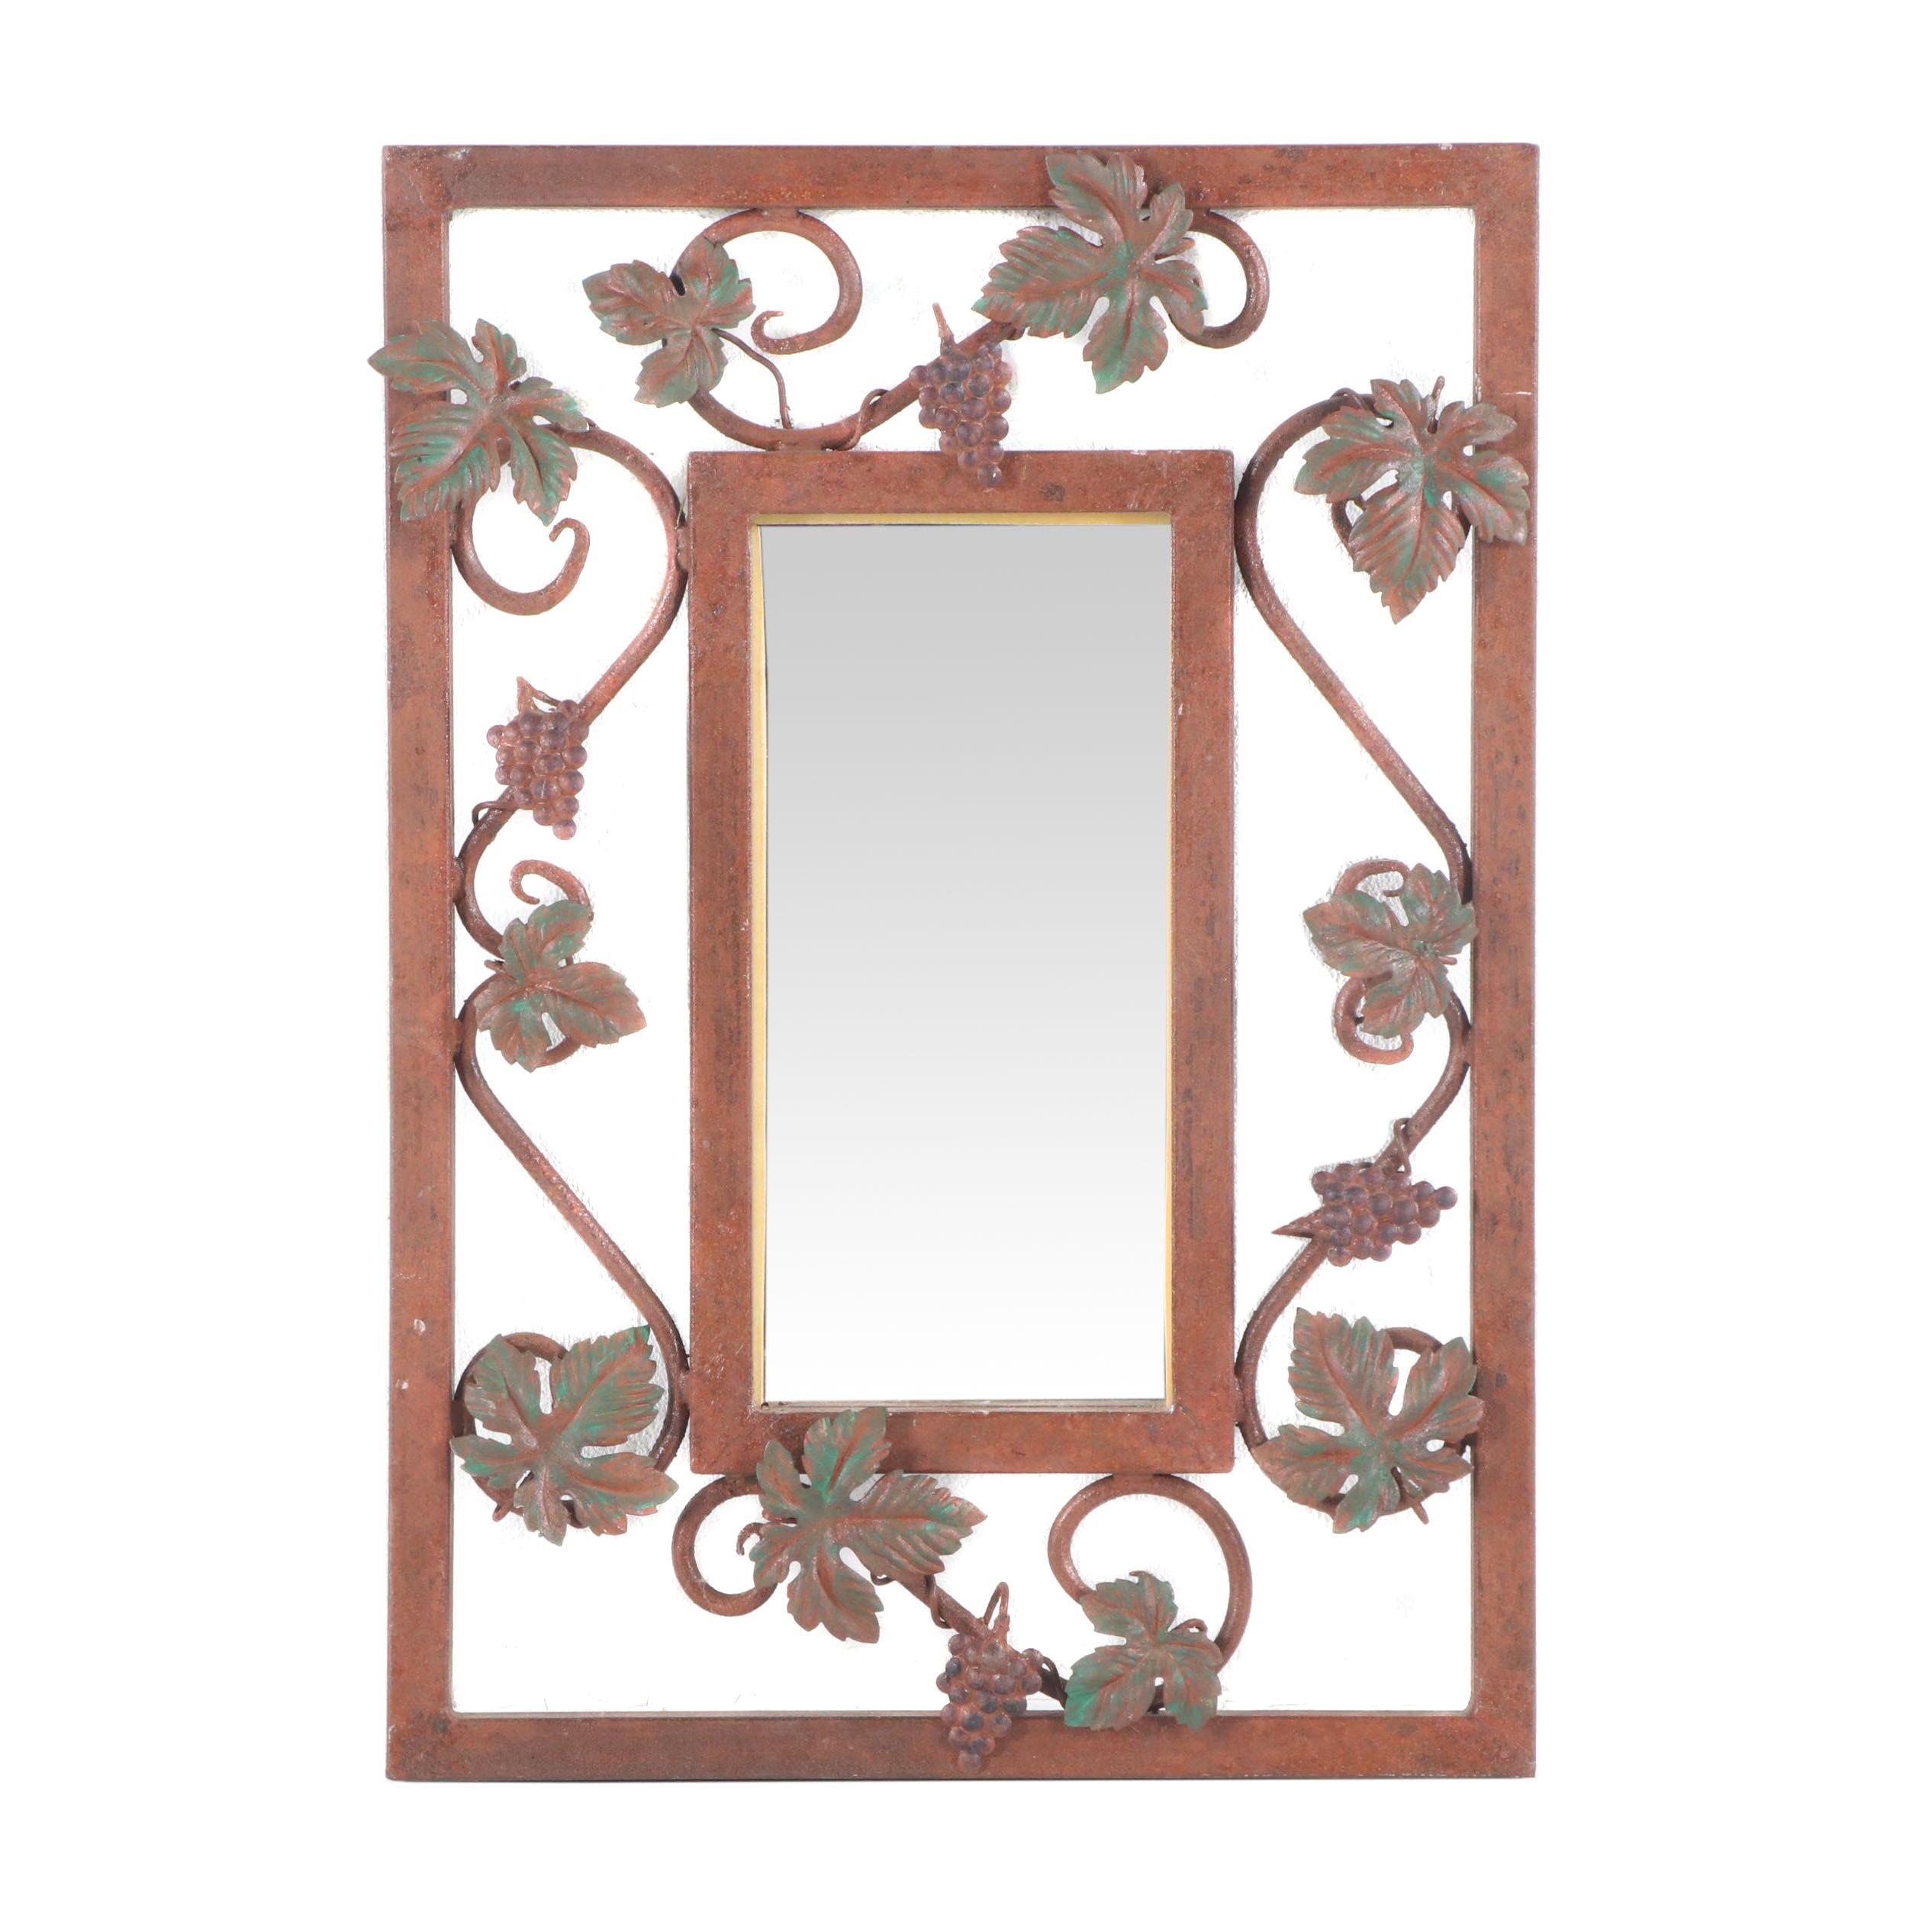 Wrought Metal Rectangular Grape Cluster Mirror